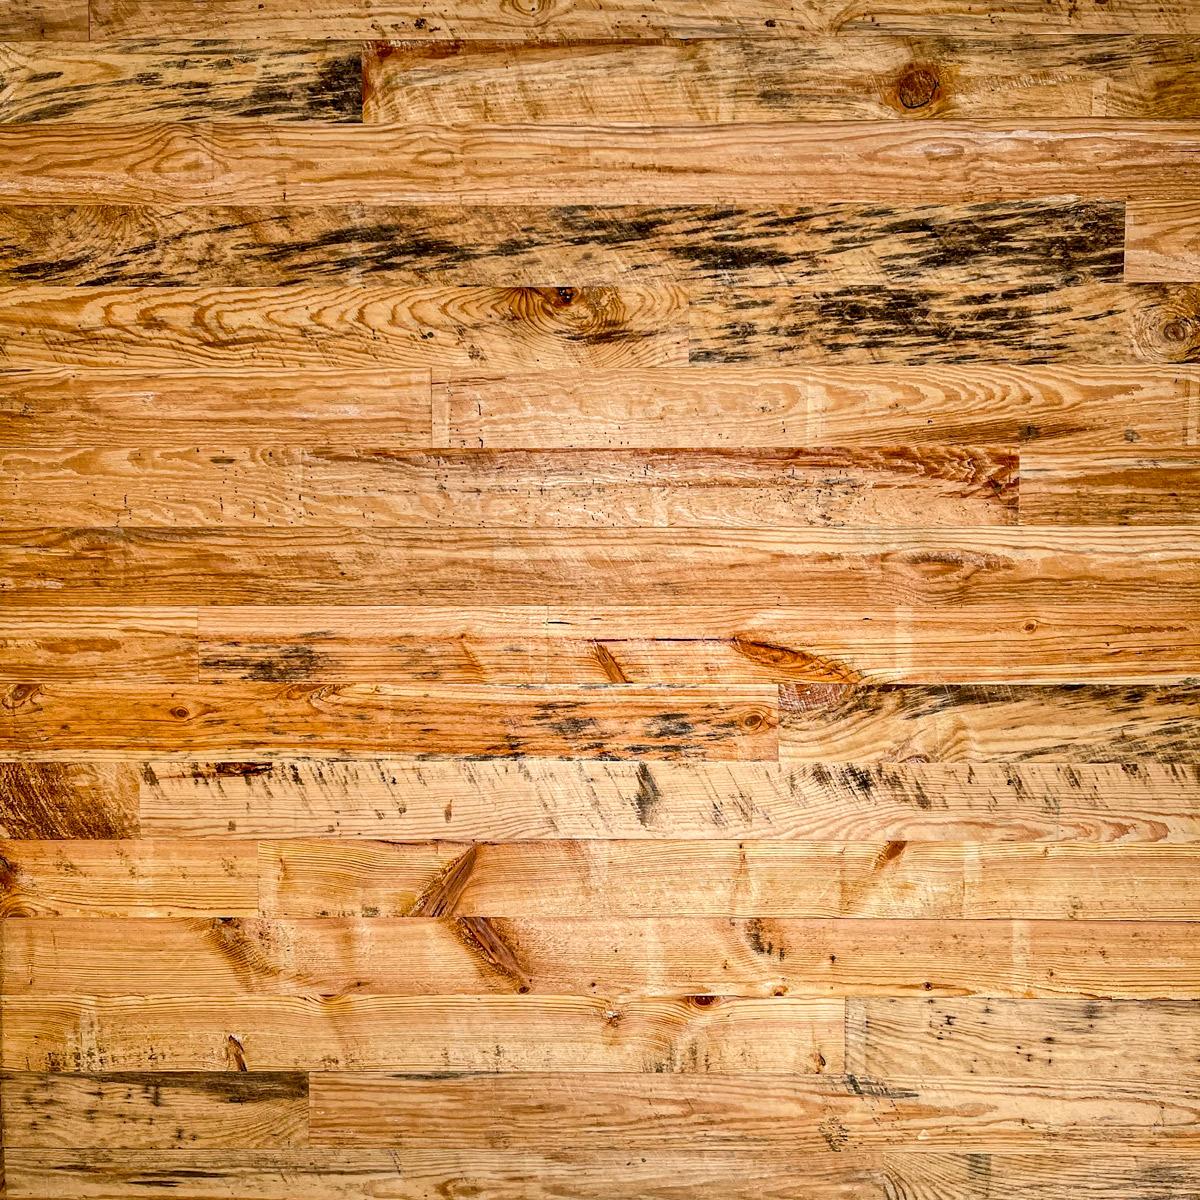 Pine wood siding